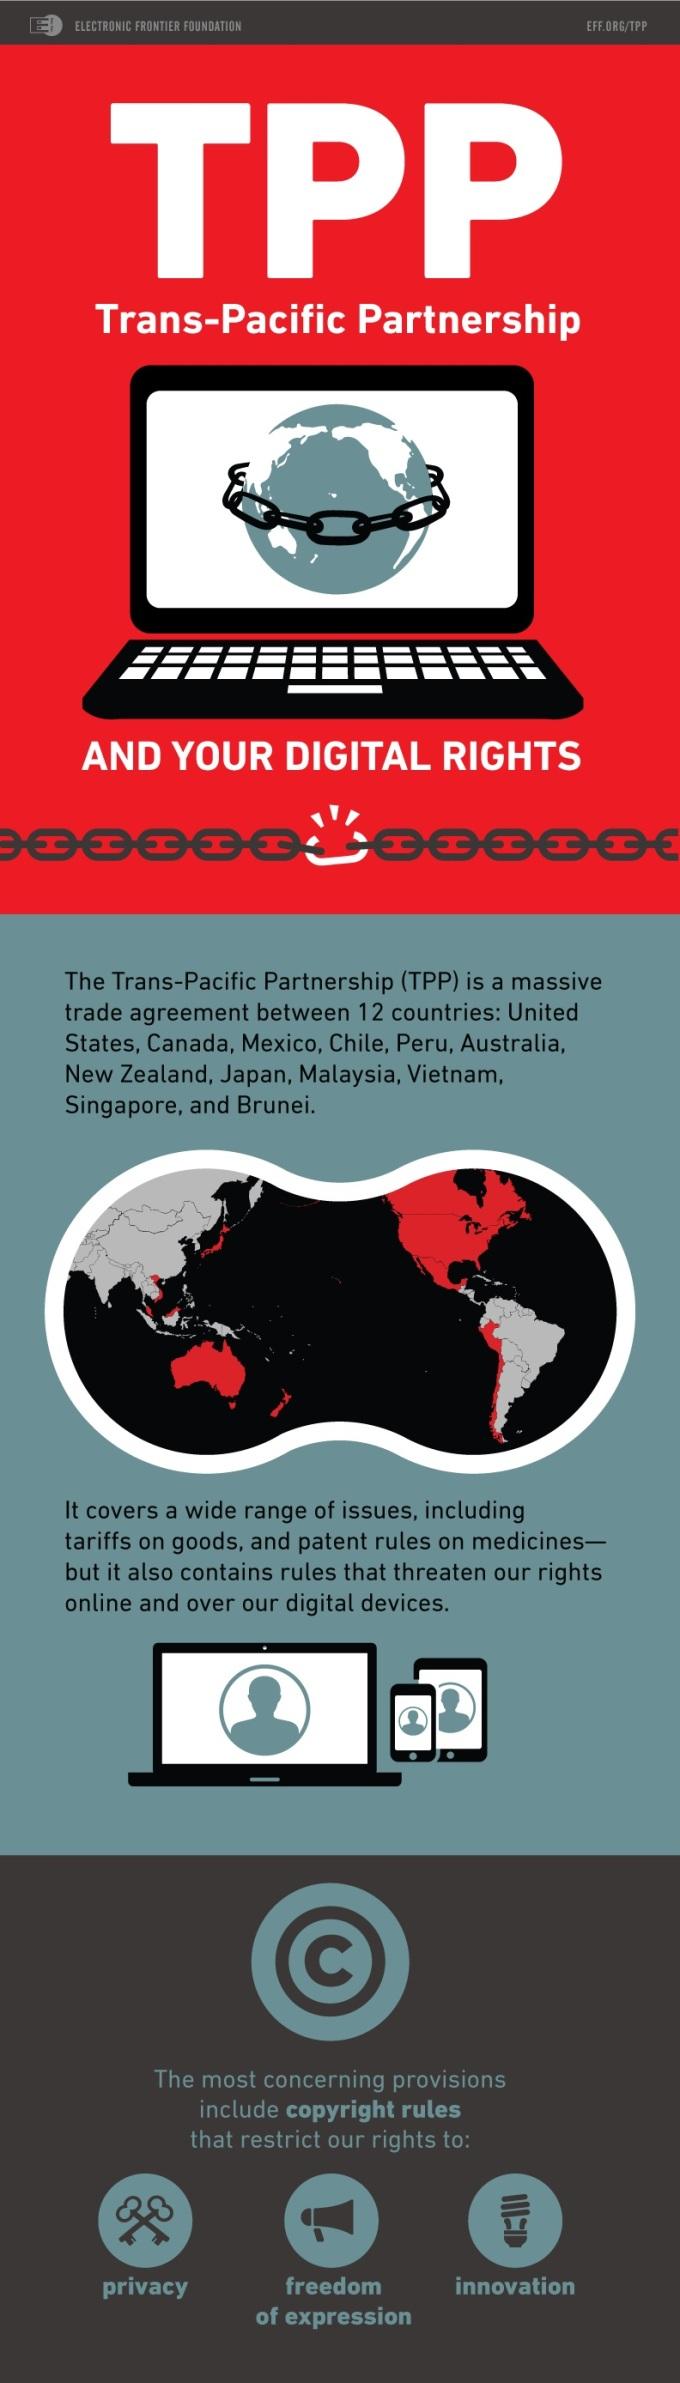 tpp-infographic-1